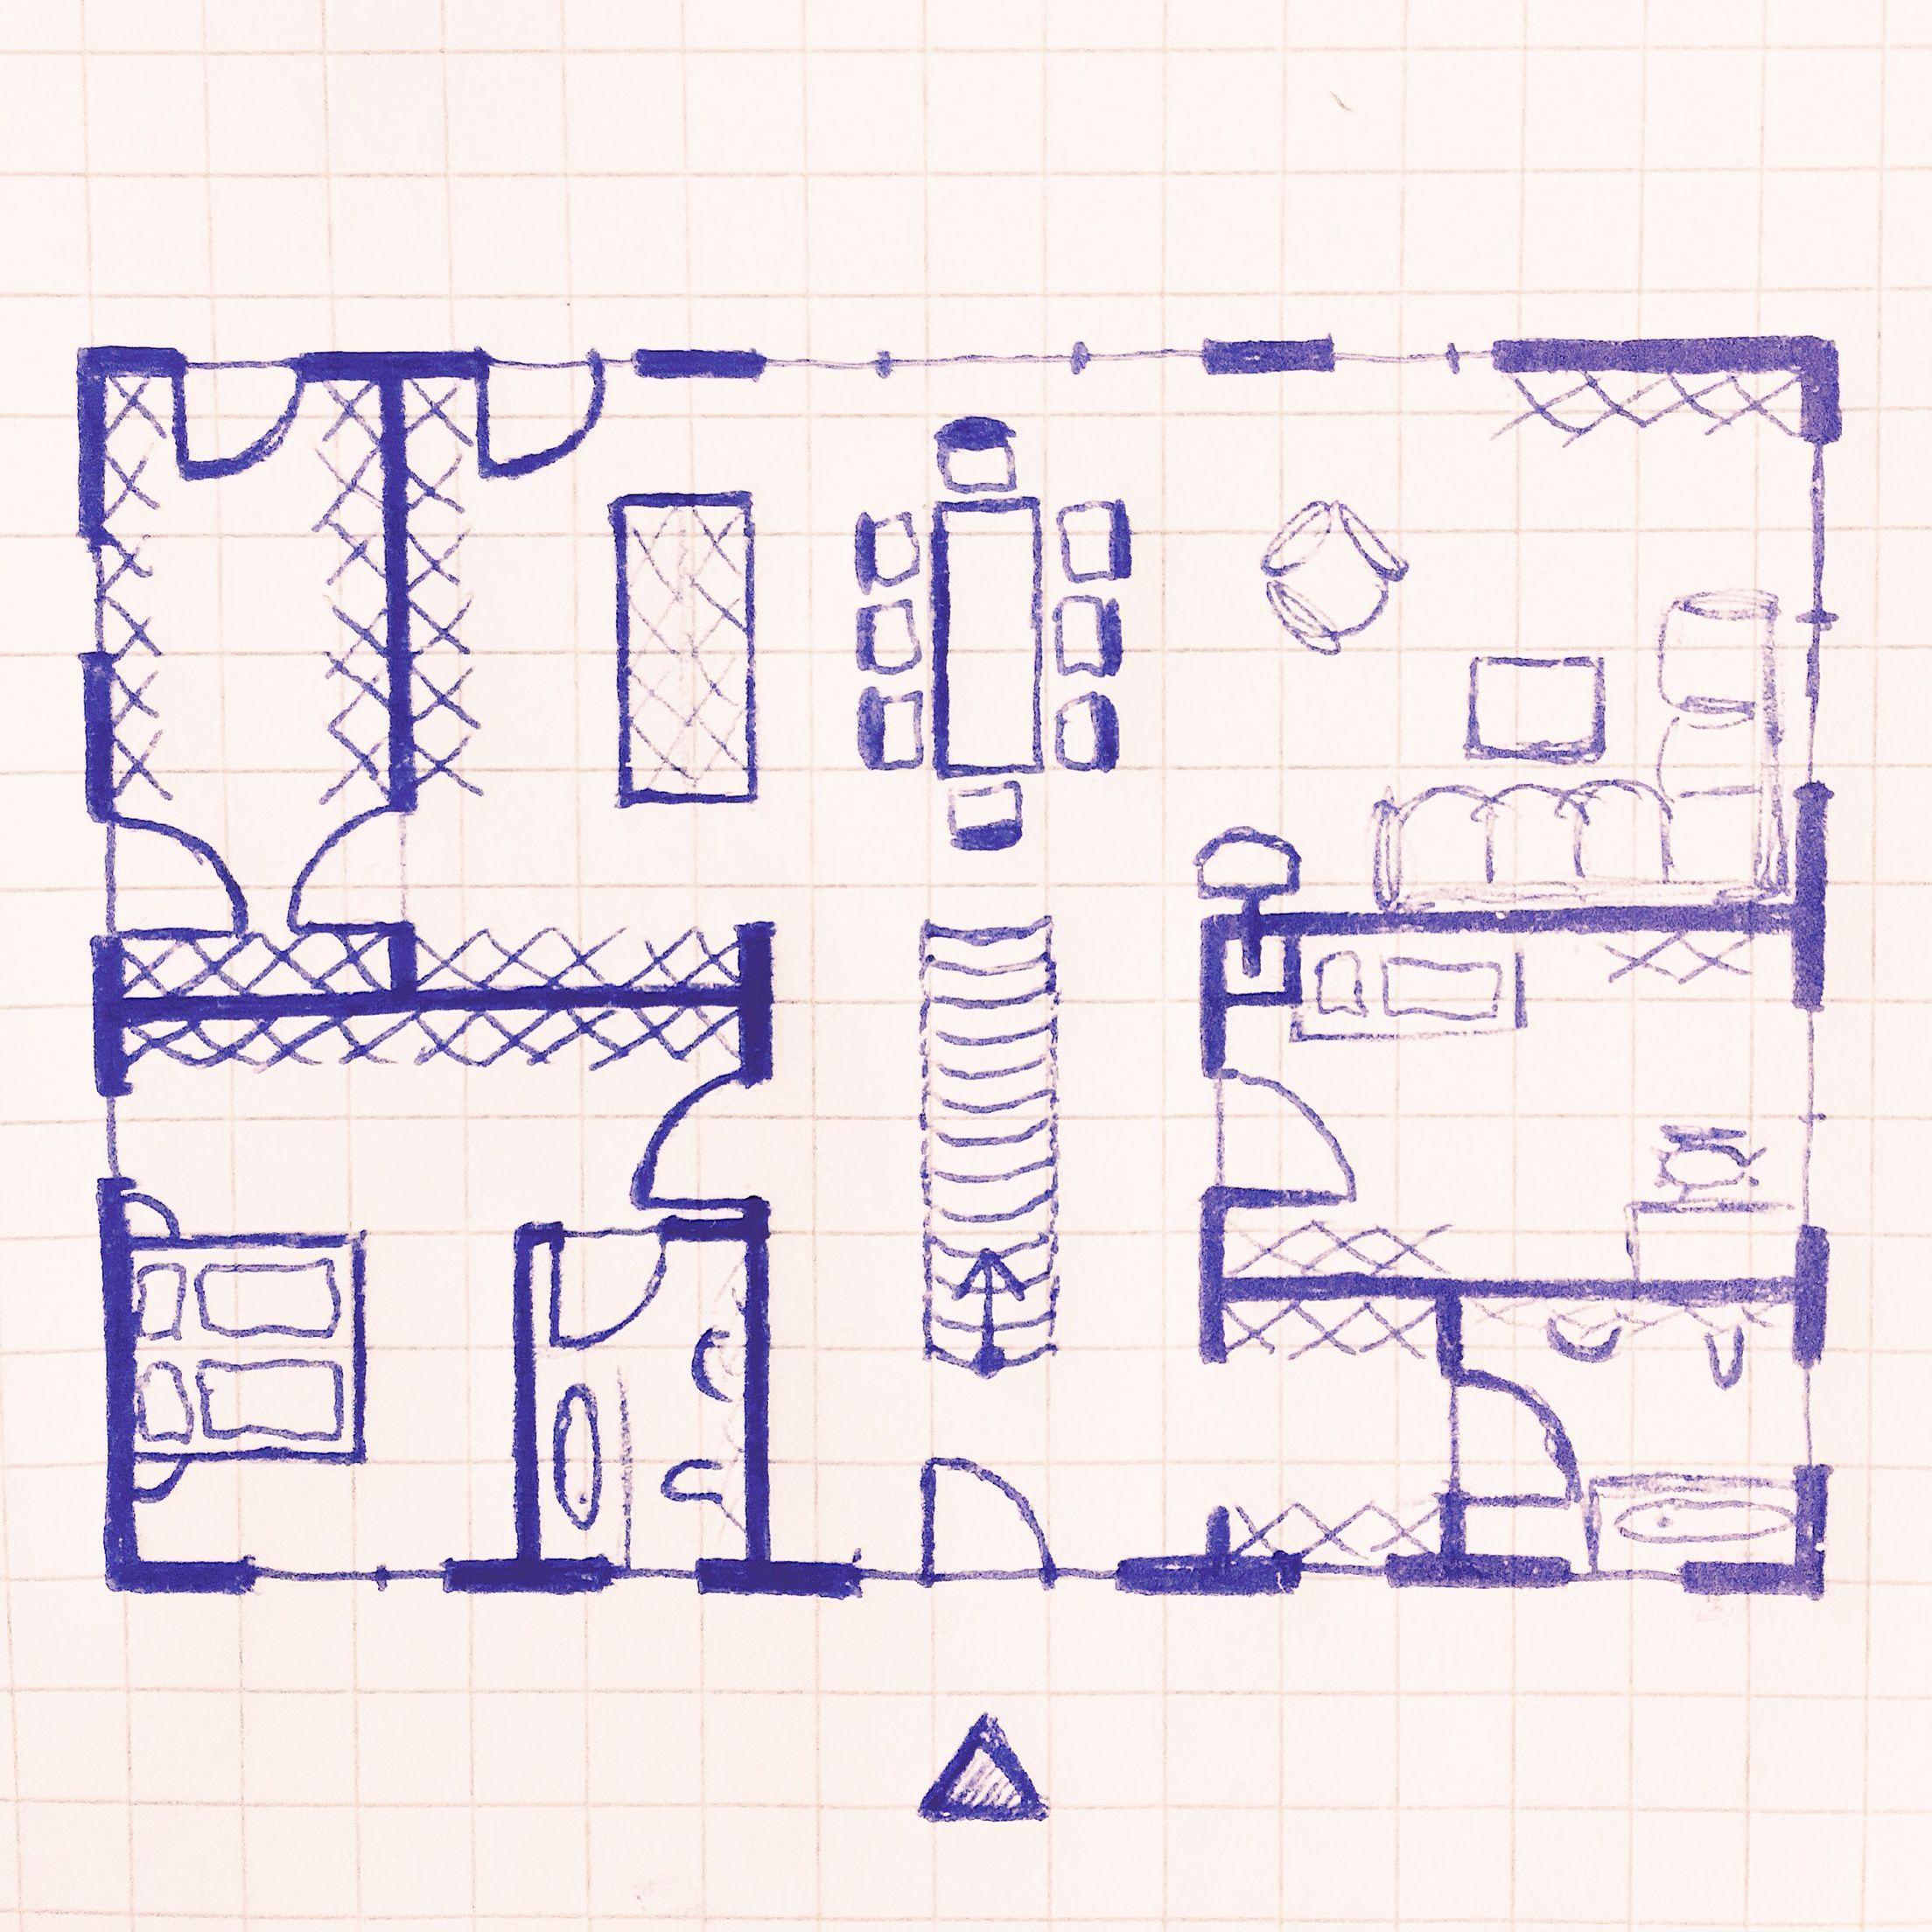 Bungalow 150qm | GRUNDRISSE by Wohnjunkie | Bungalow, Floor plans ...